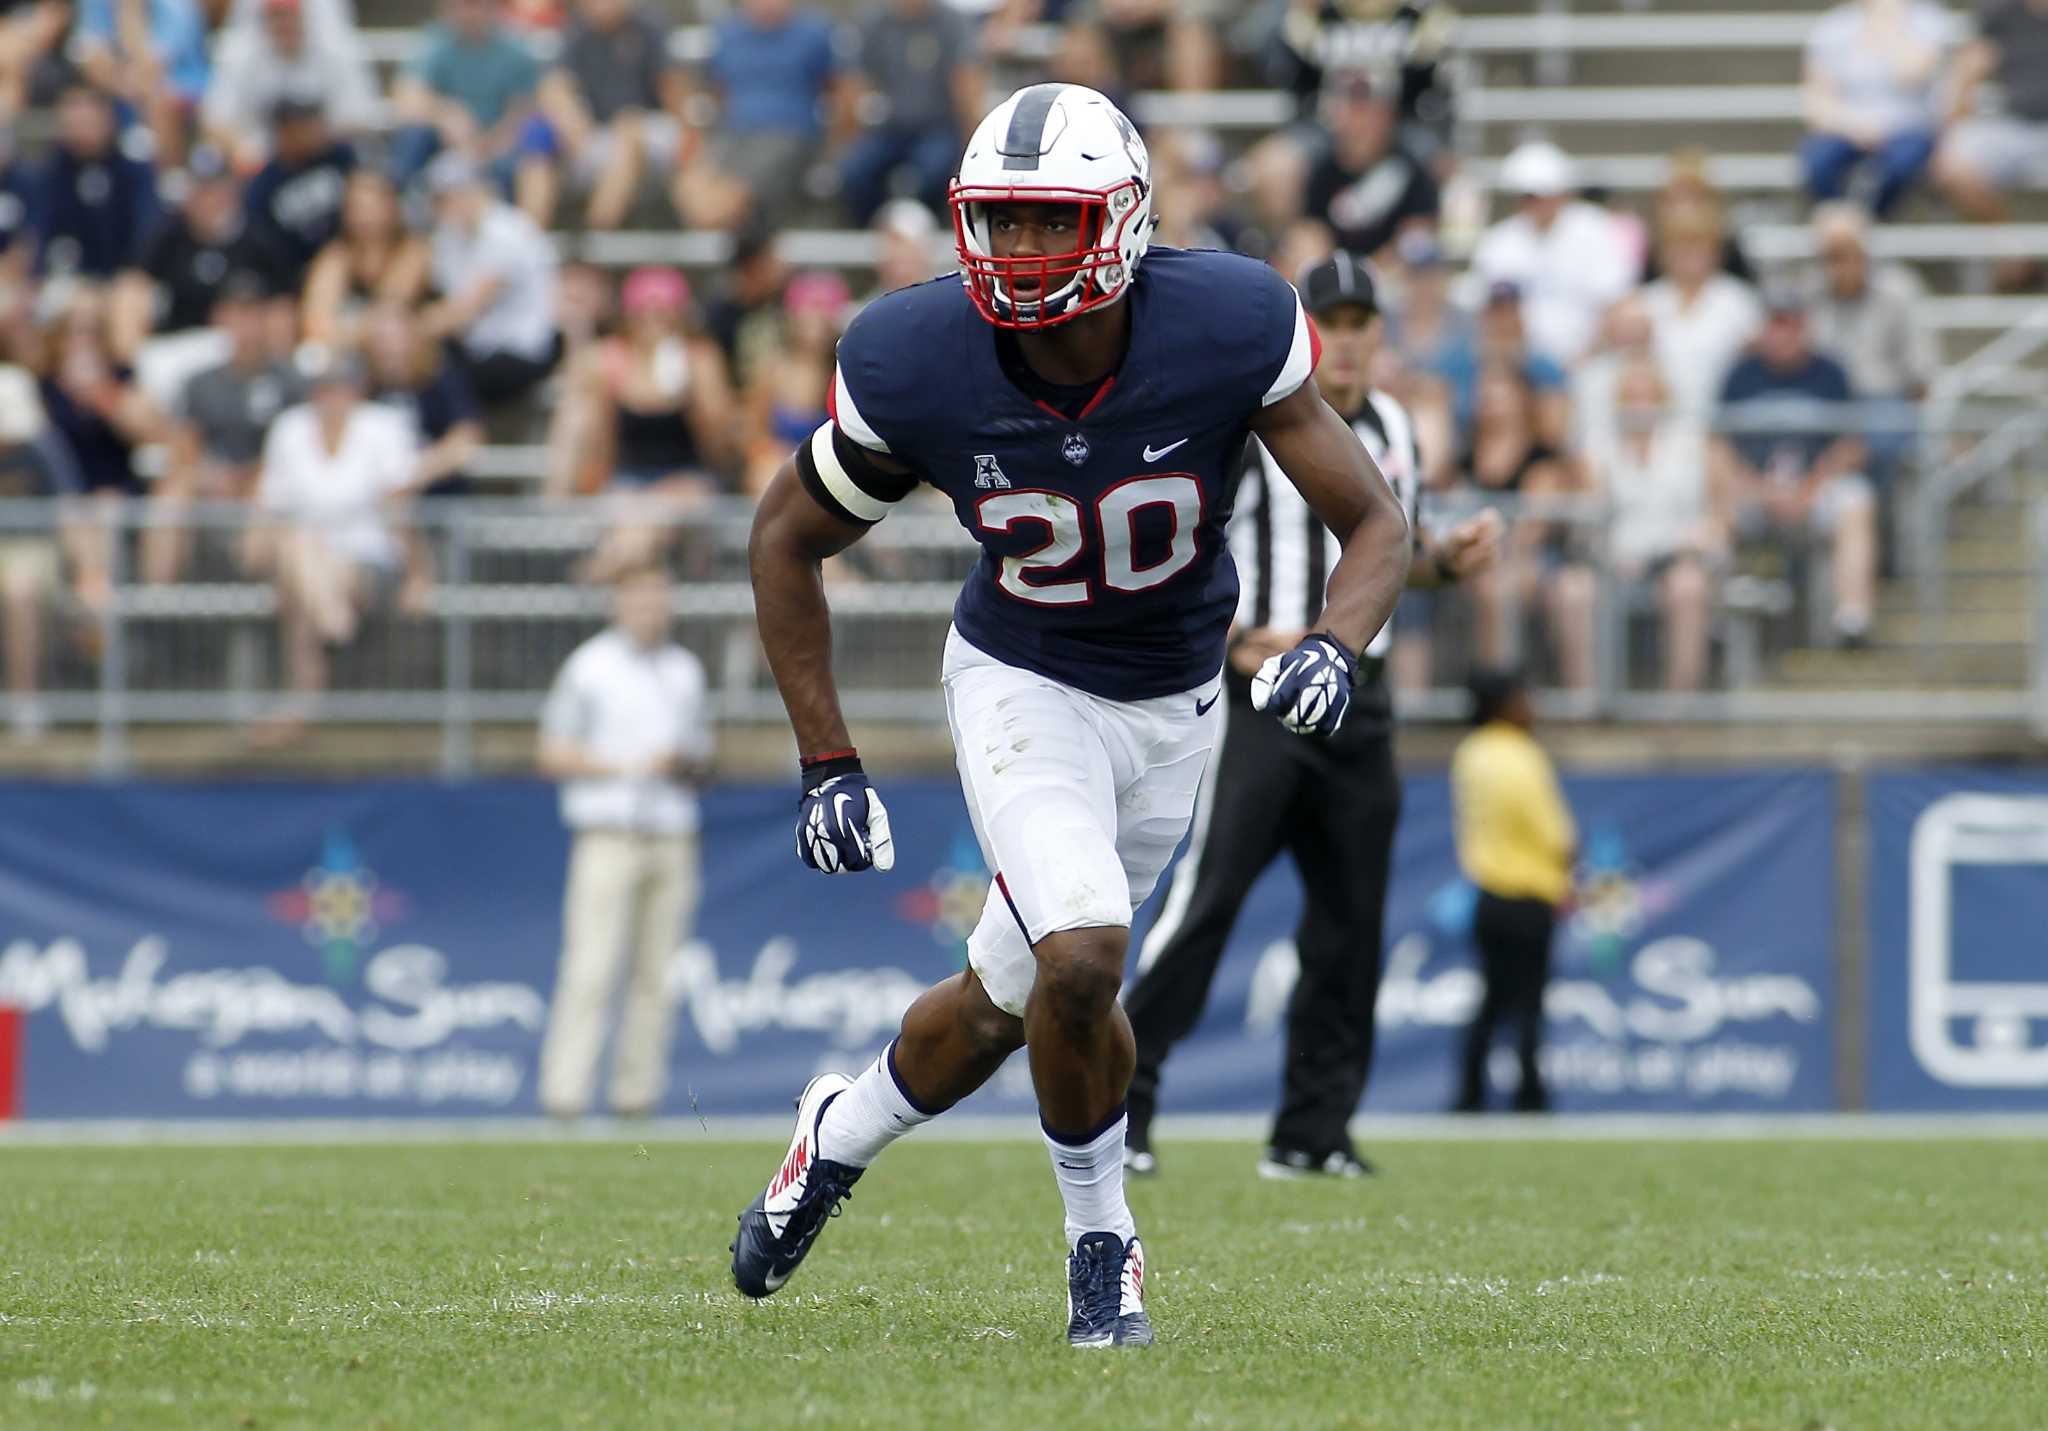 2dd2f2571 Rising UConn corner-safety Obi Melifonwu visits a dozen NFL teams - Houston  Chronicle